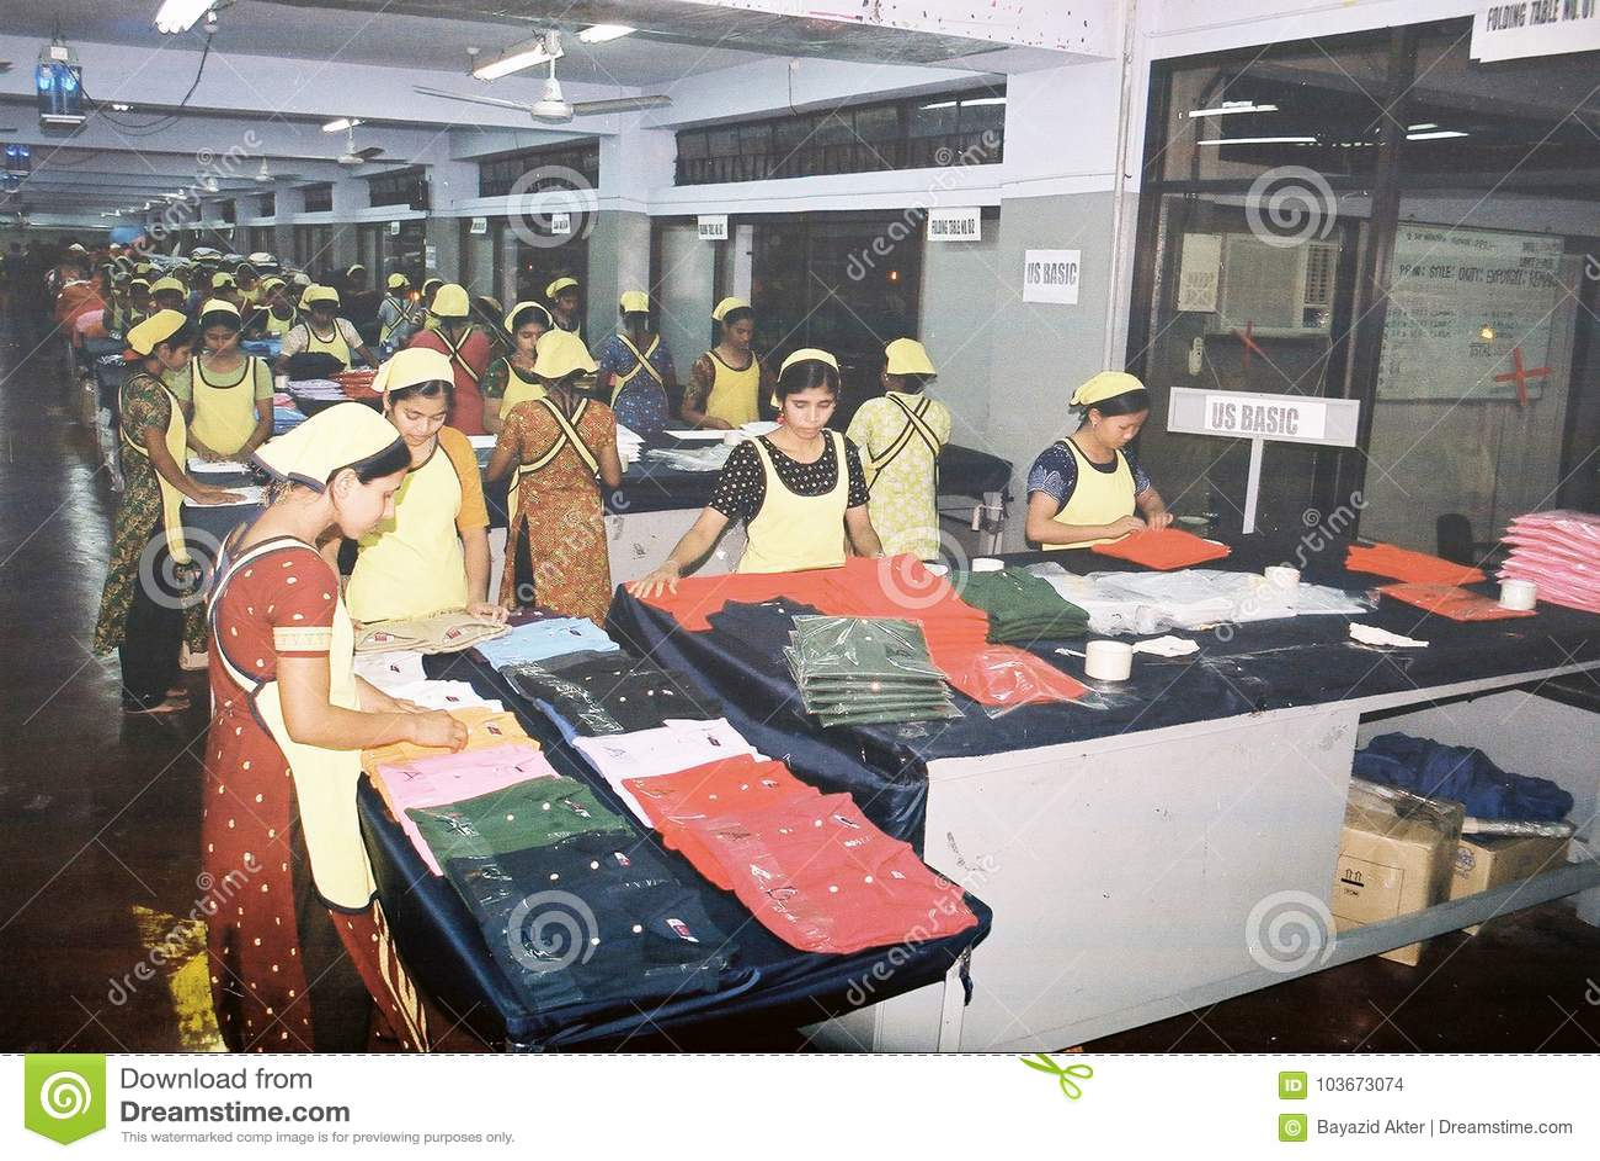 garments industries of bangladesh Our companies: group corporate  geebee garments industries ltd, sfb 3, dhaka epz, ganakbari, savar, dhaka, bangladesh tel no –880-2-9890960 fax no +880-2.